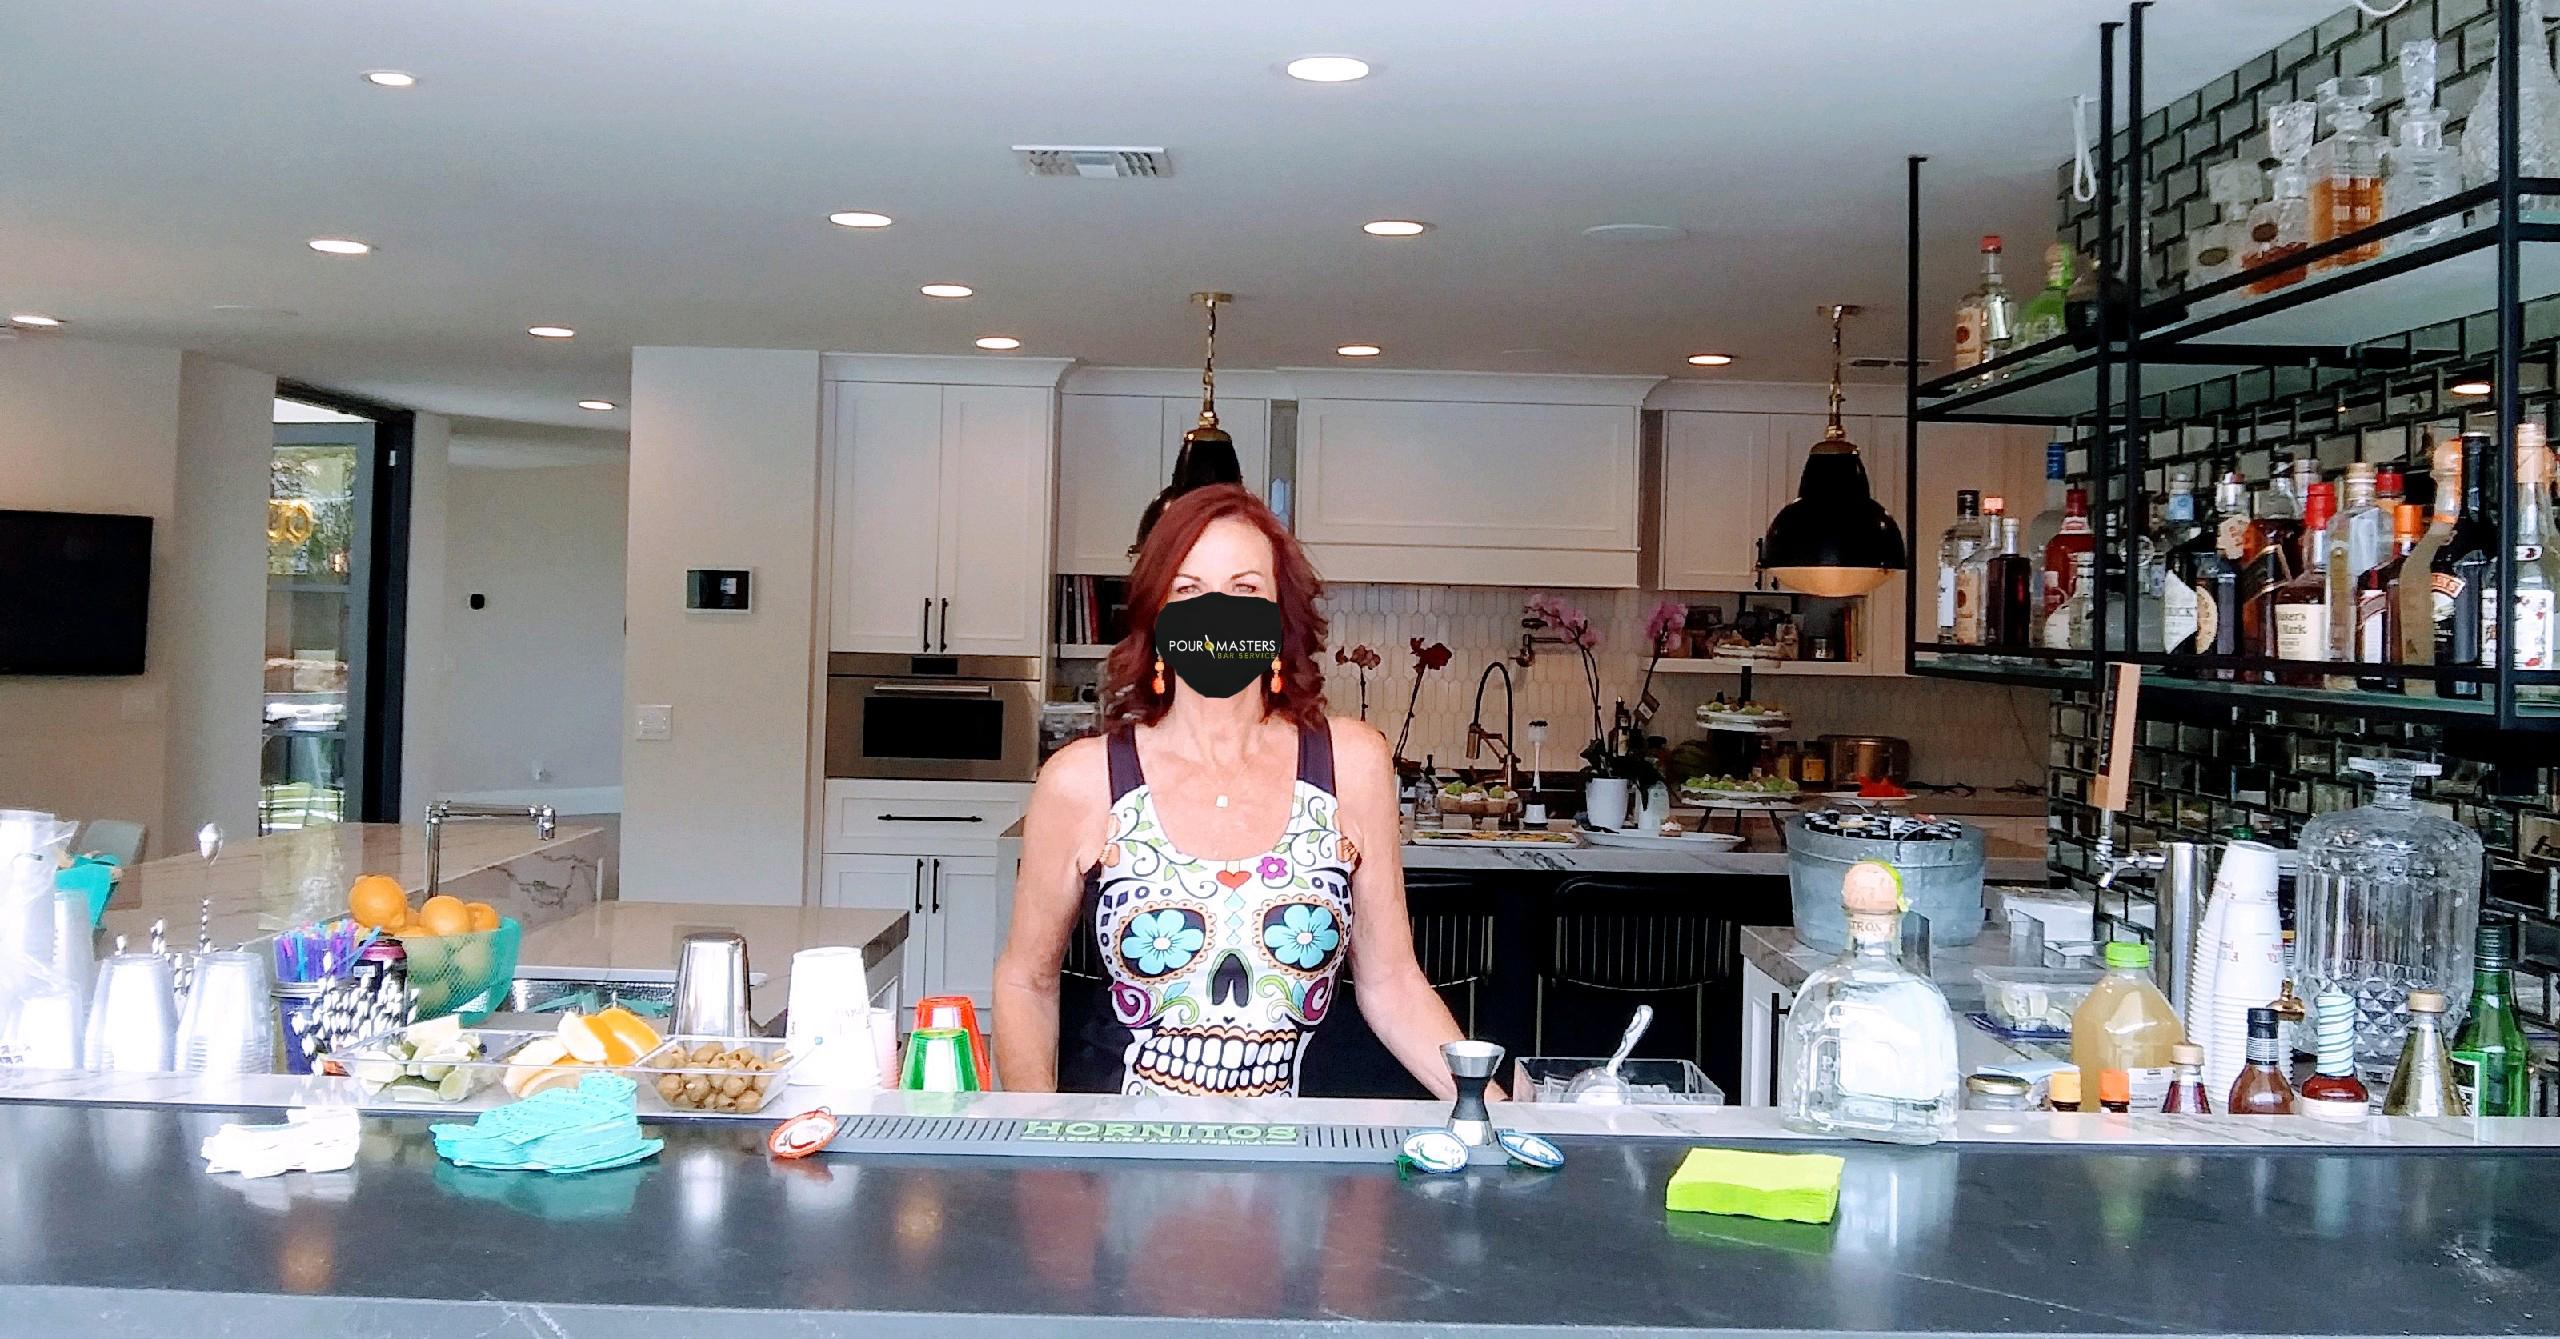 Bartender wearing a mask